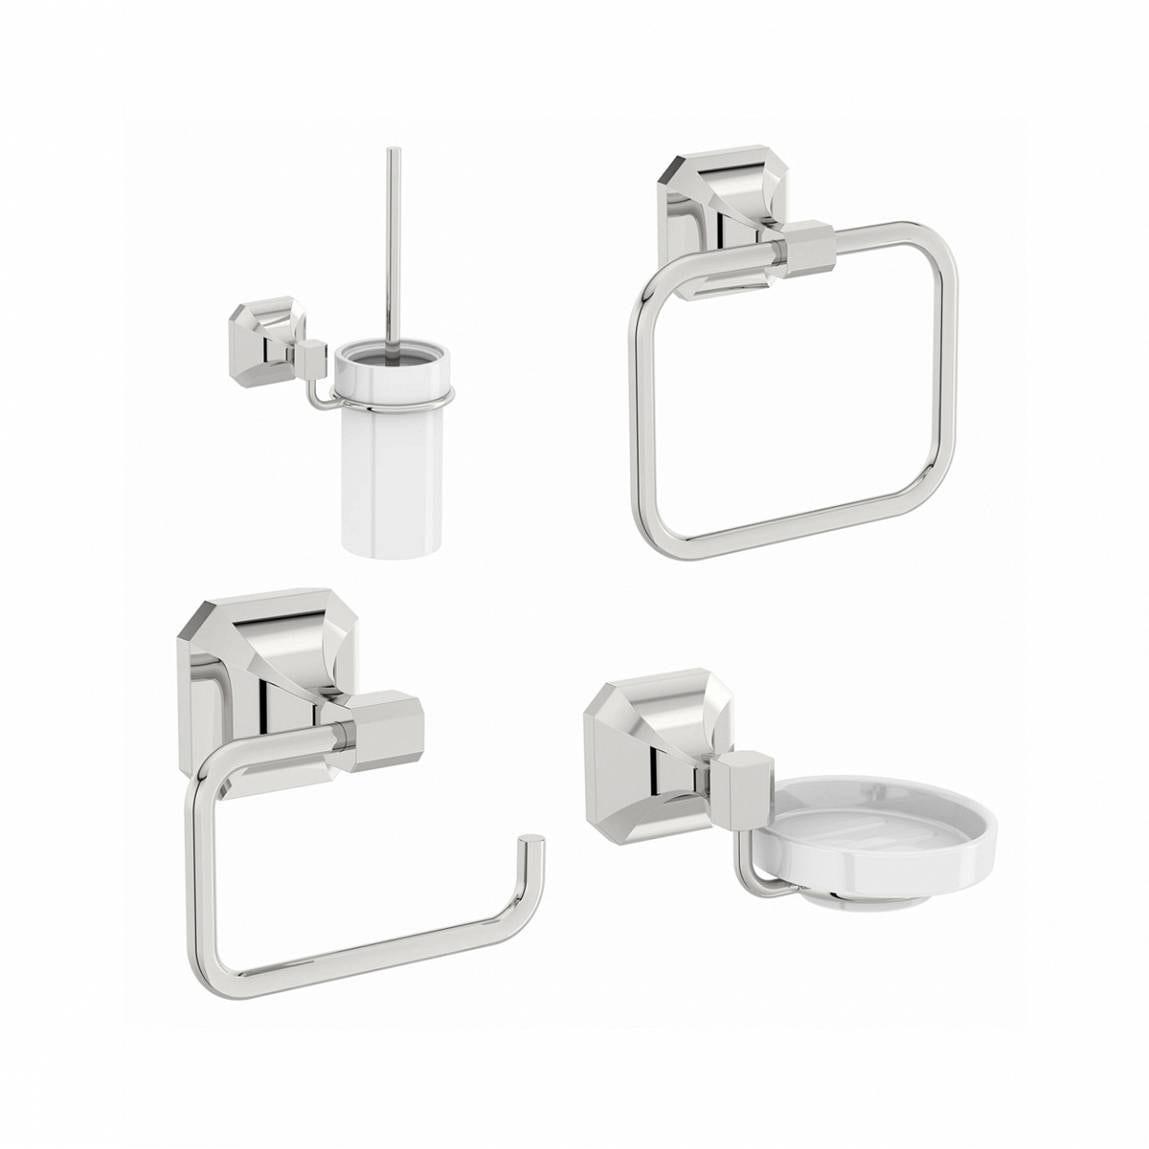 The Bath Co. Camberley cloakroom accessory set